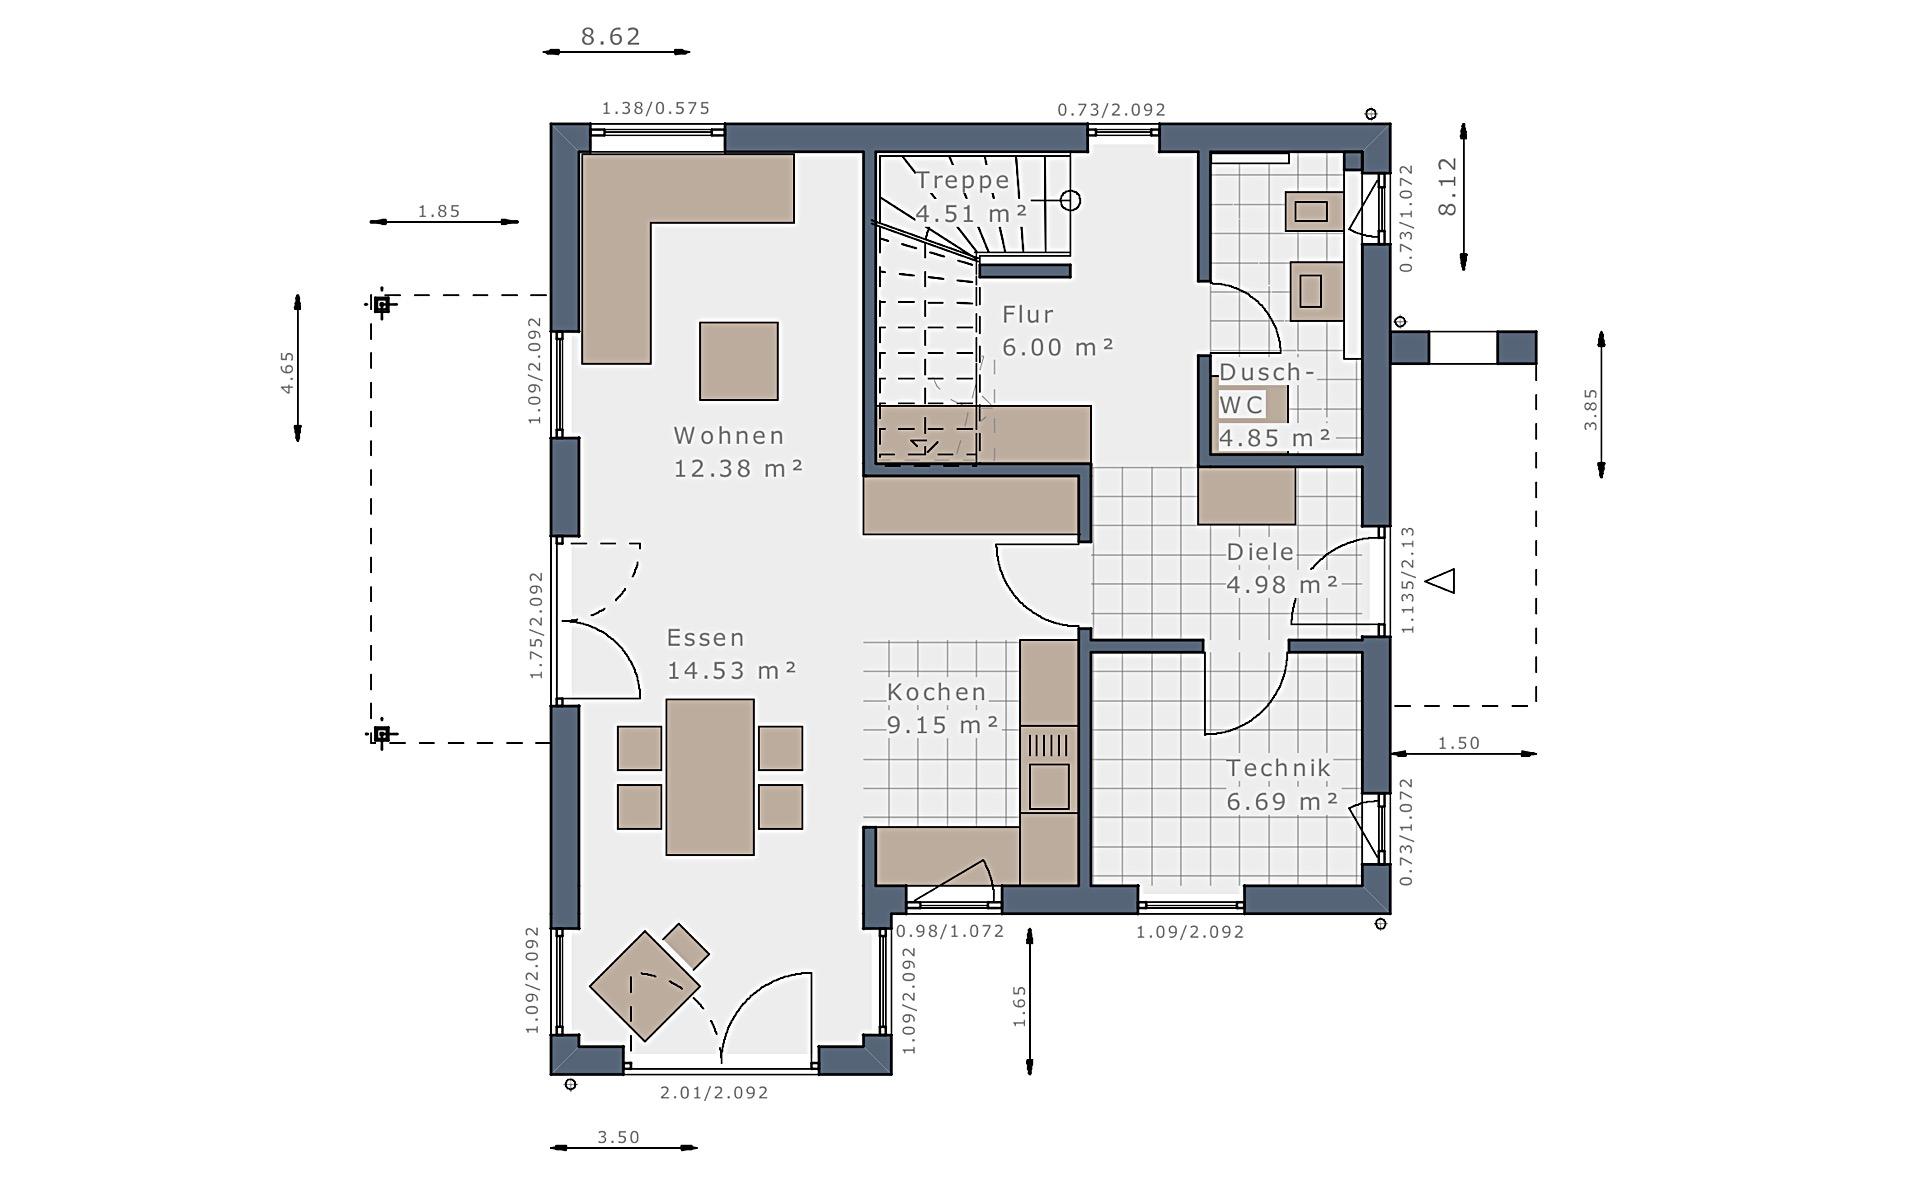 Erdgeschoss Solitaire-E-115 E2 von Schwabenhaus GmbH & Co. KG